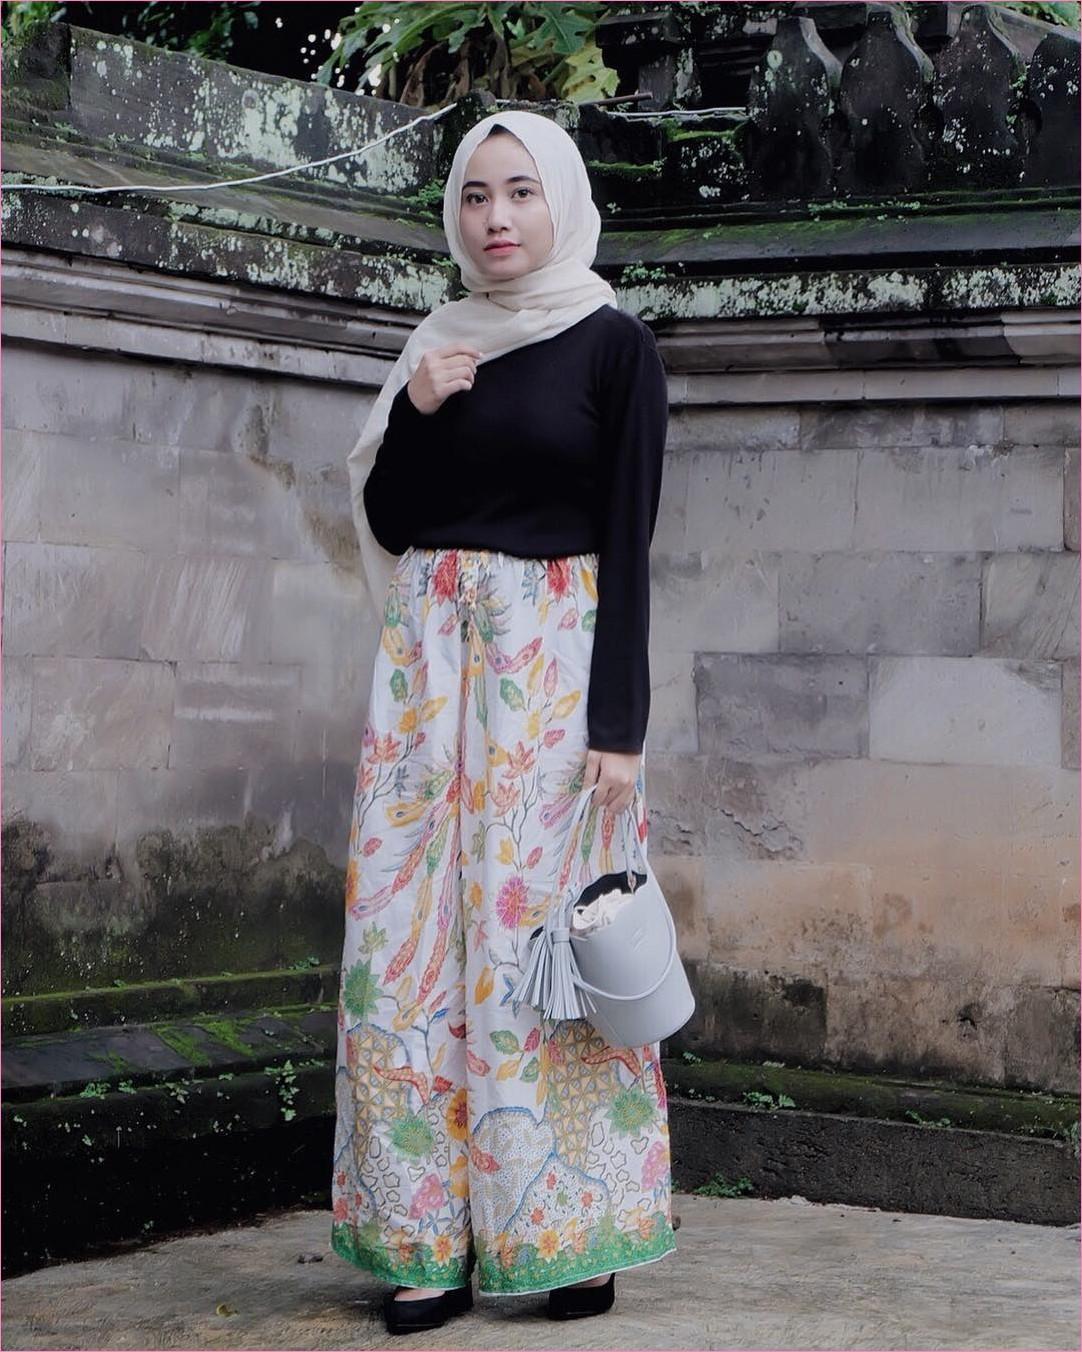 Outfit Celana Cullotes Untuk Hijabers Ala Selebgram 2018 blouse mangset high heels lace ups hitam cullotes motif batik hijau muda pink hijab pashmina rawis putihl slingbags abu ootd trendy